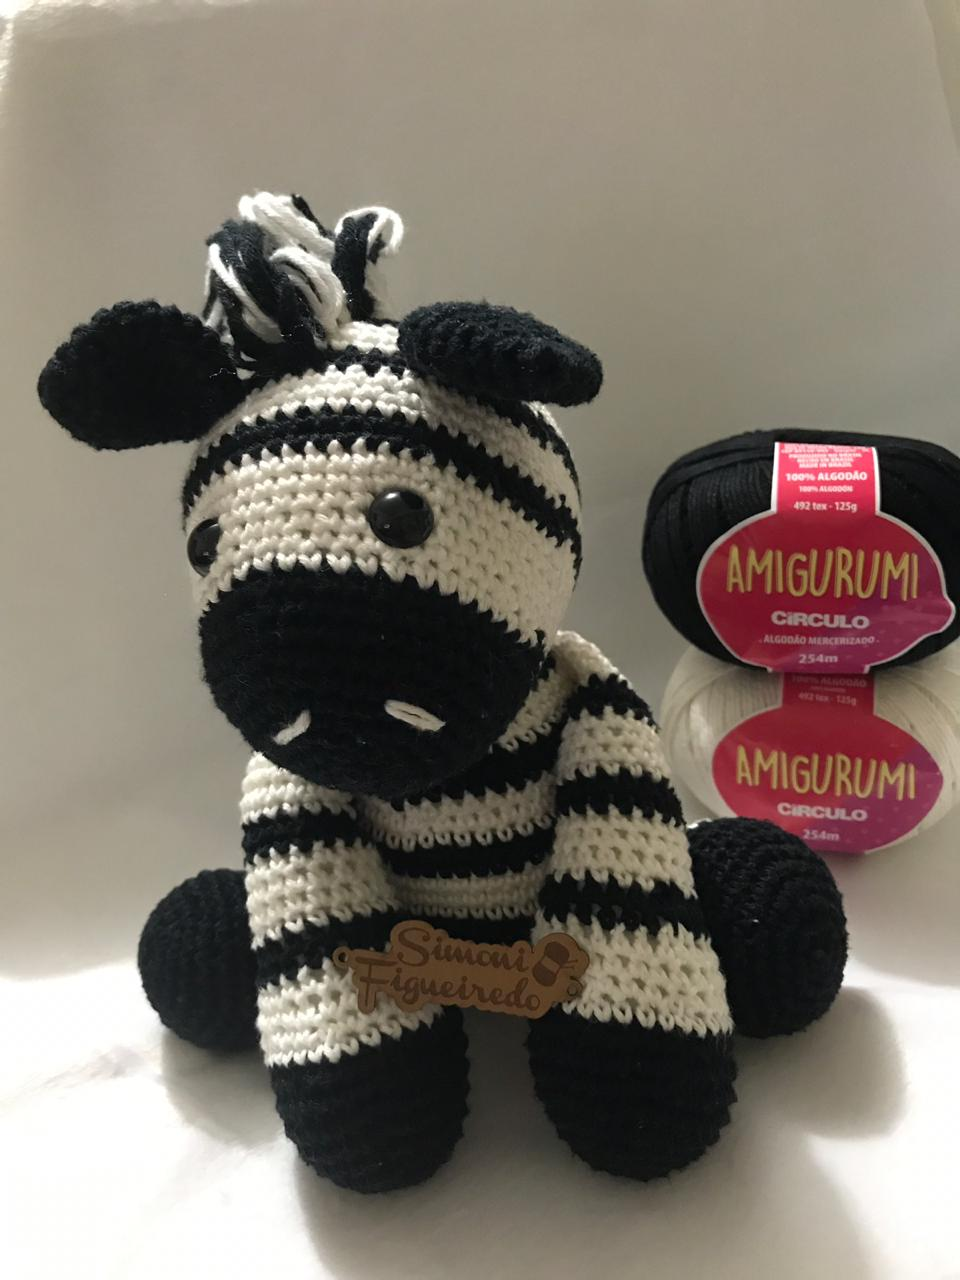 Crochet Stuffed Zebra Amigurumi Toy - Buy Stuffed Zebra Amigurumi ... | 1280x960